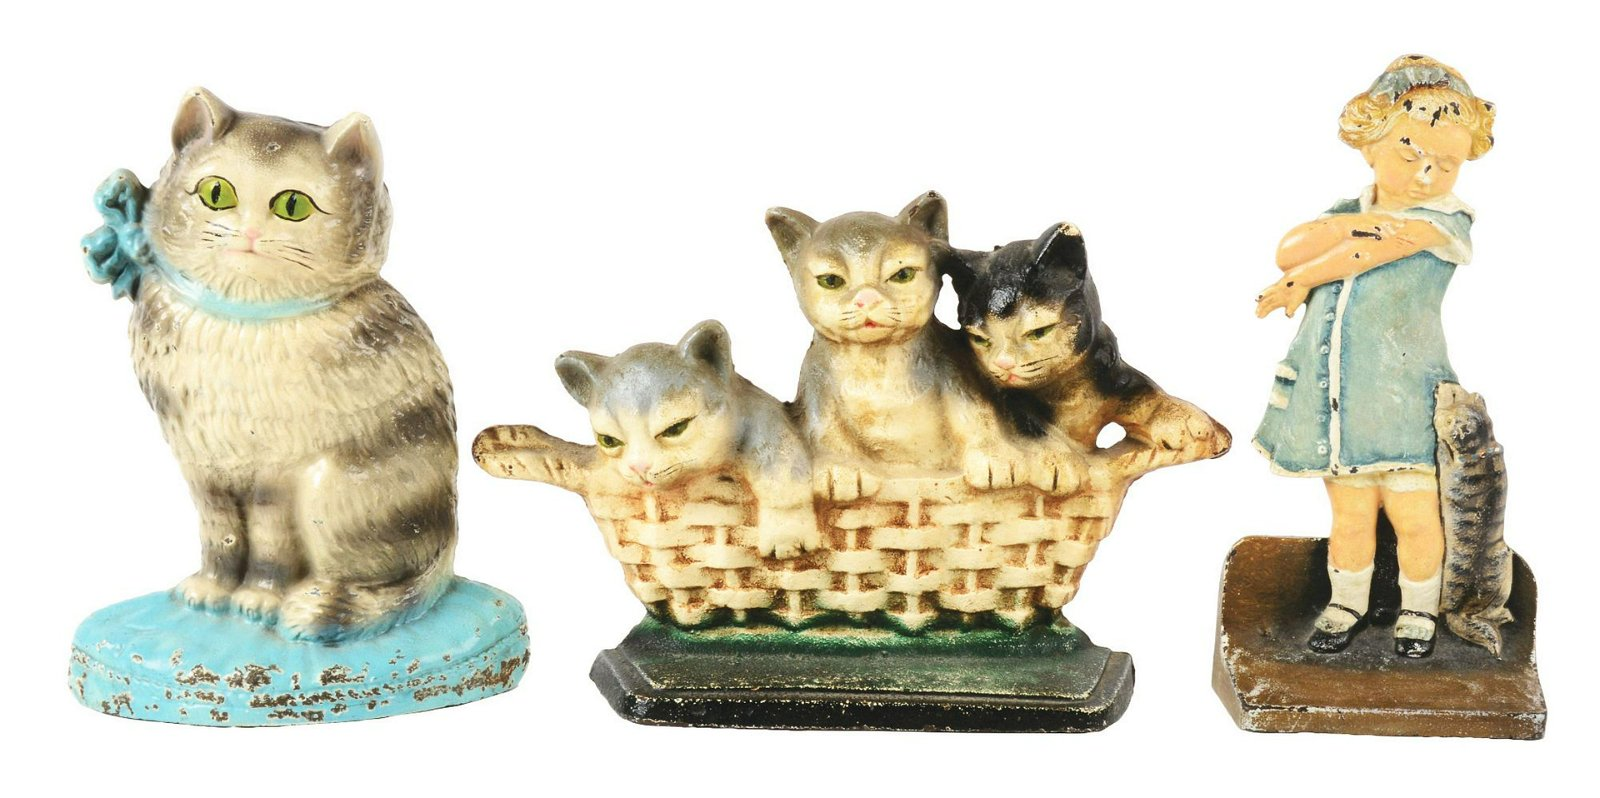 Lot of 3: Cast-Iron Cat & Cat Scratch Fever Doorstop.